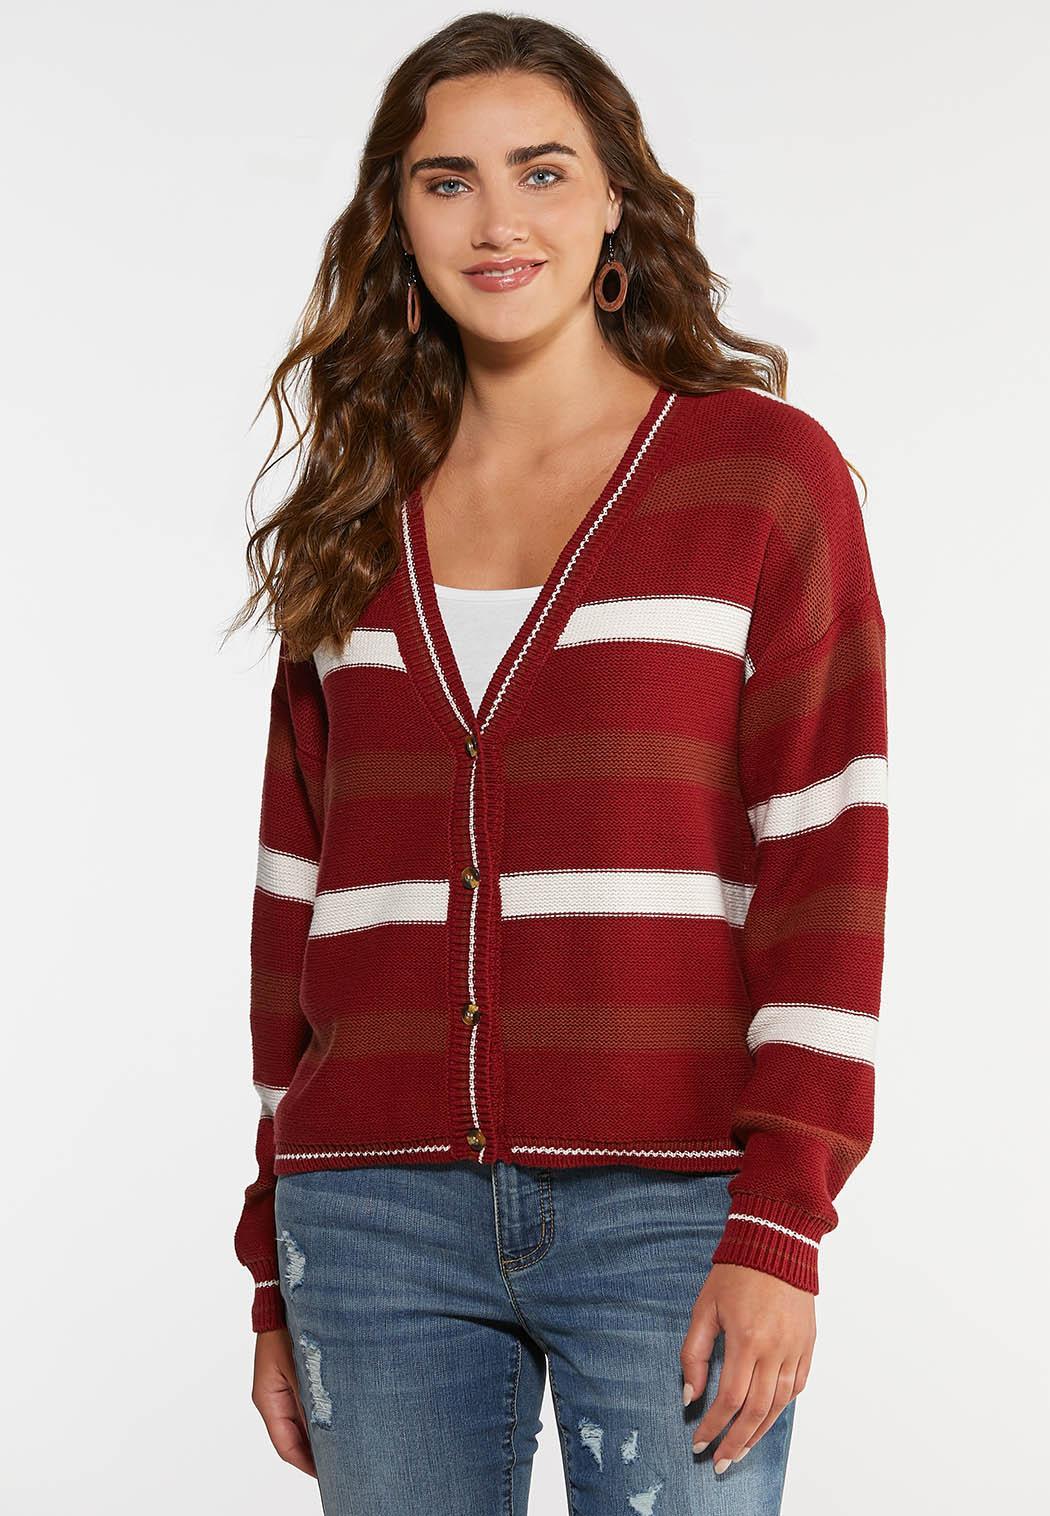 Autumn Red Cardigan Sweater